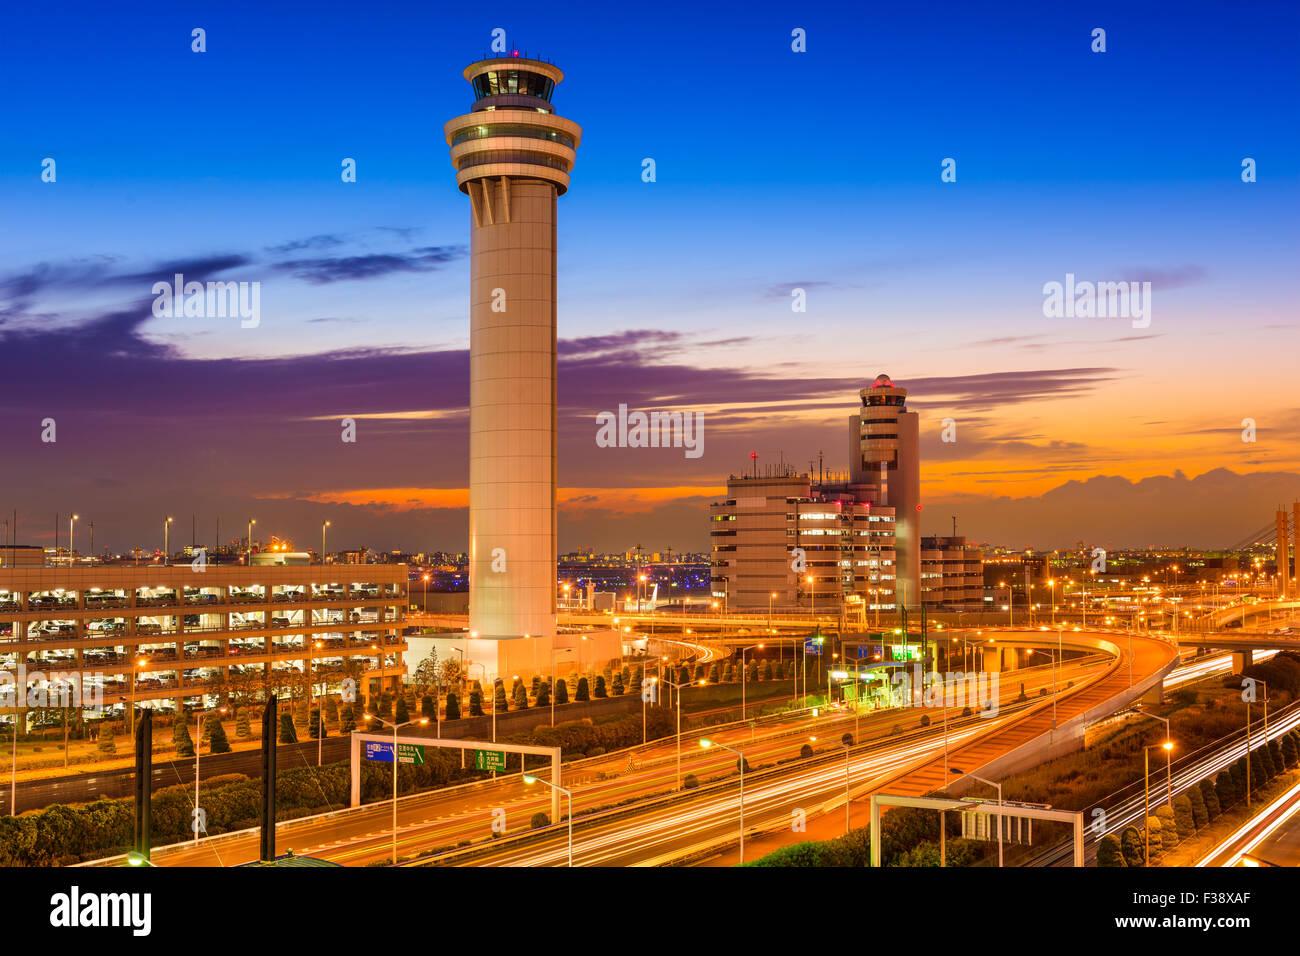 Aeroporto Tokyo : Galeria de terminal do aeroporto internacional de narita